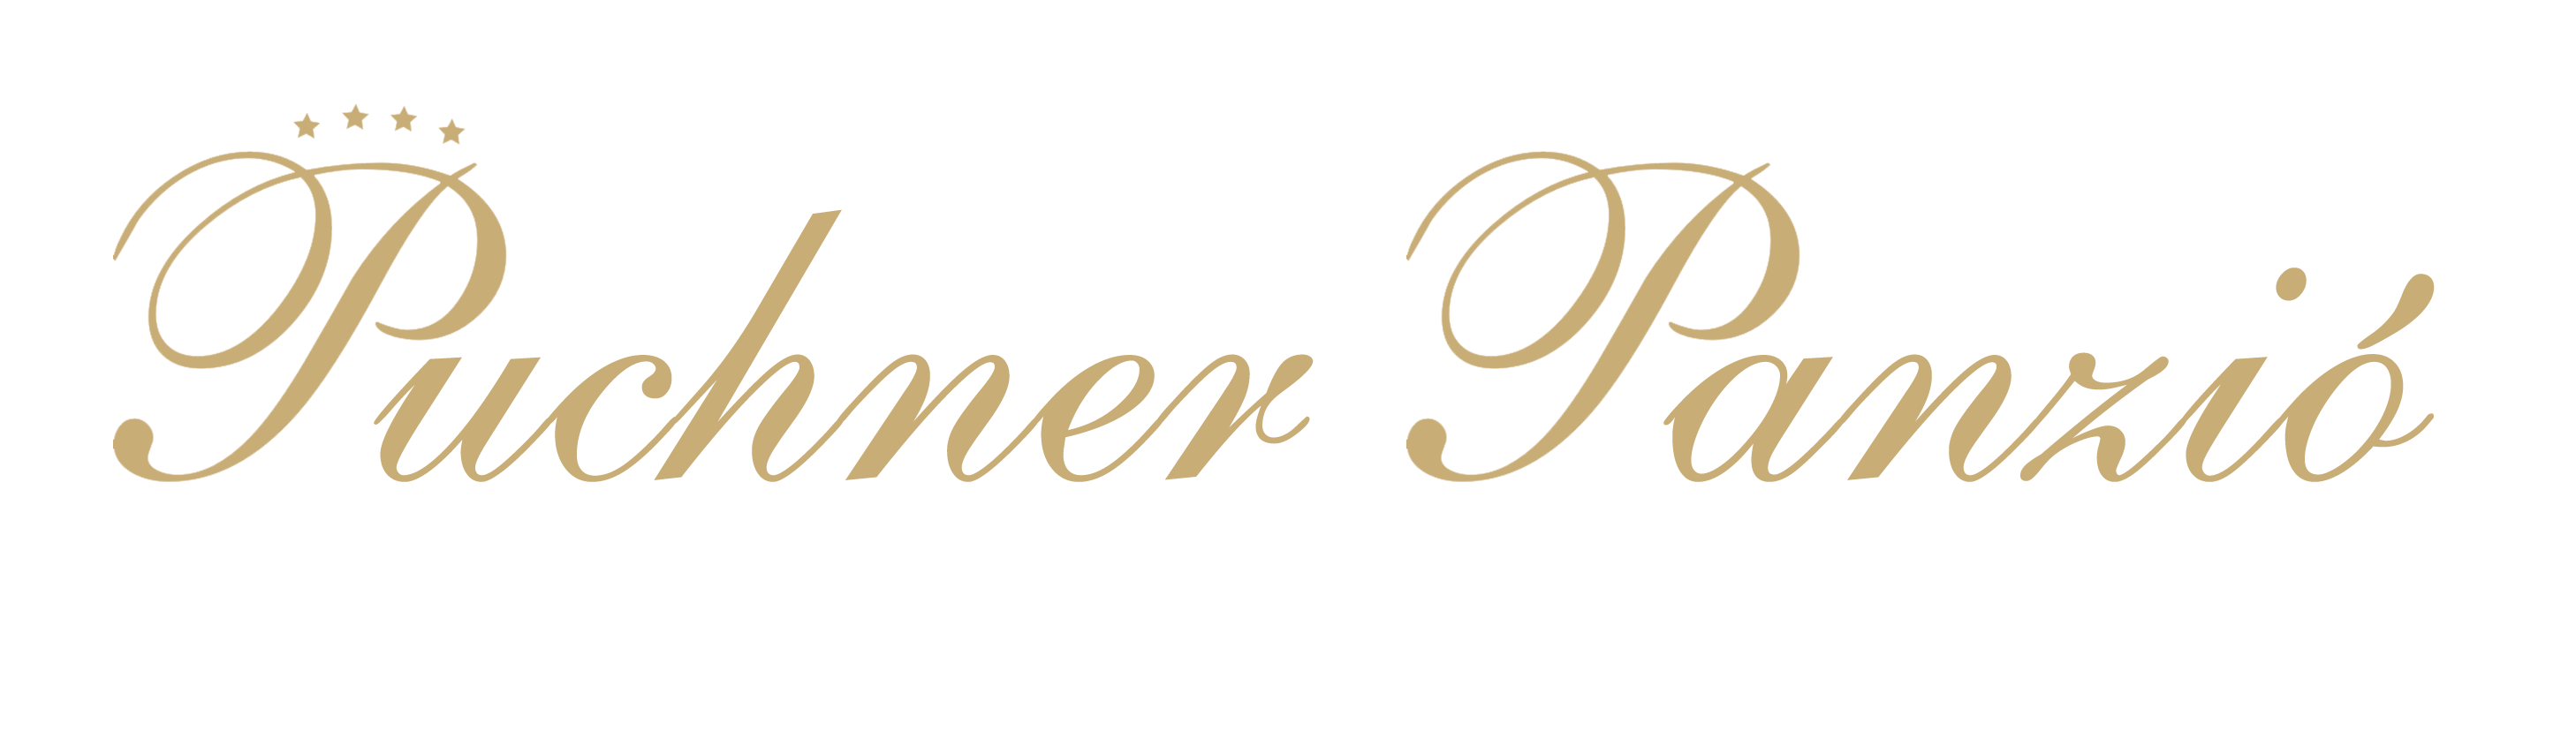 Puchner Panzió logo